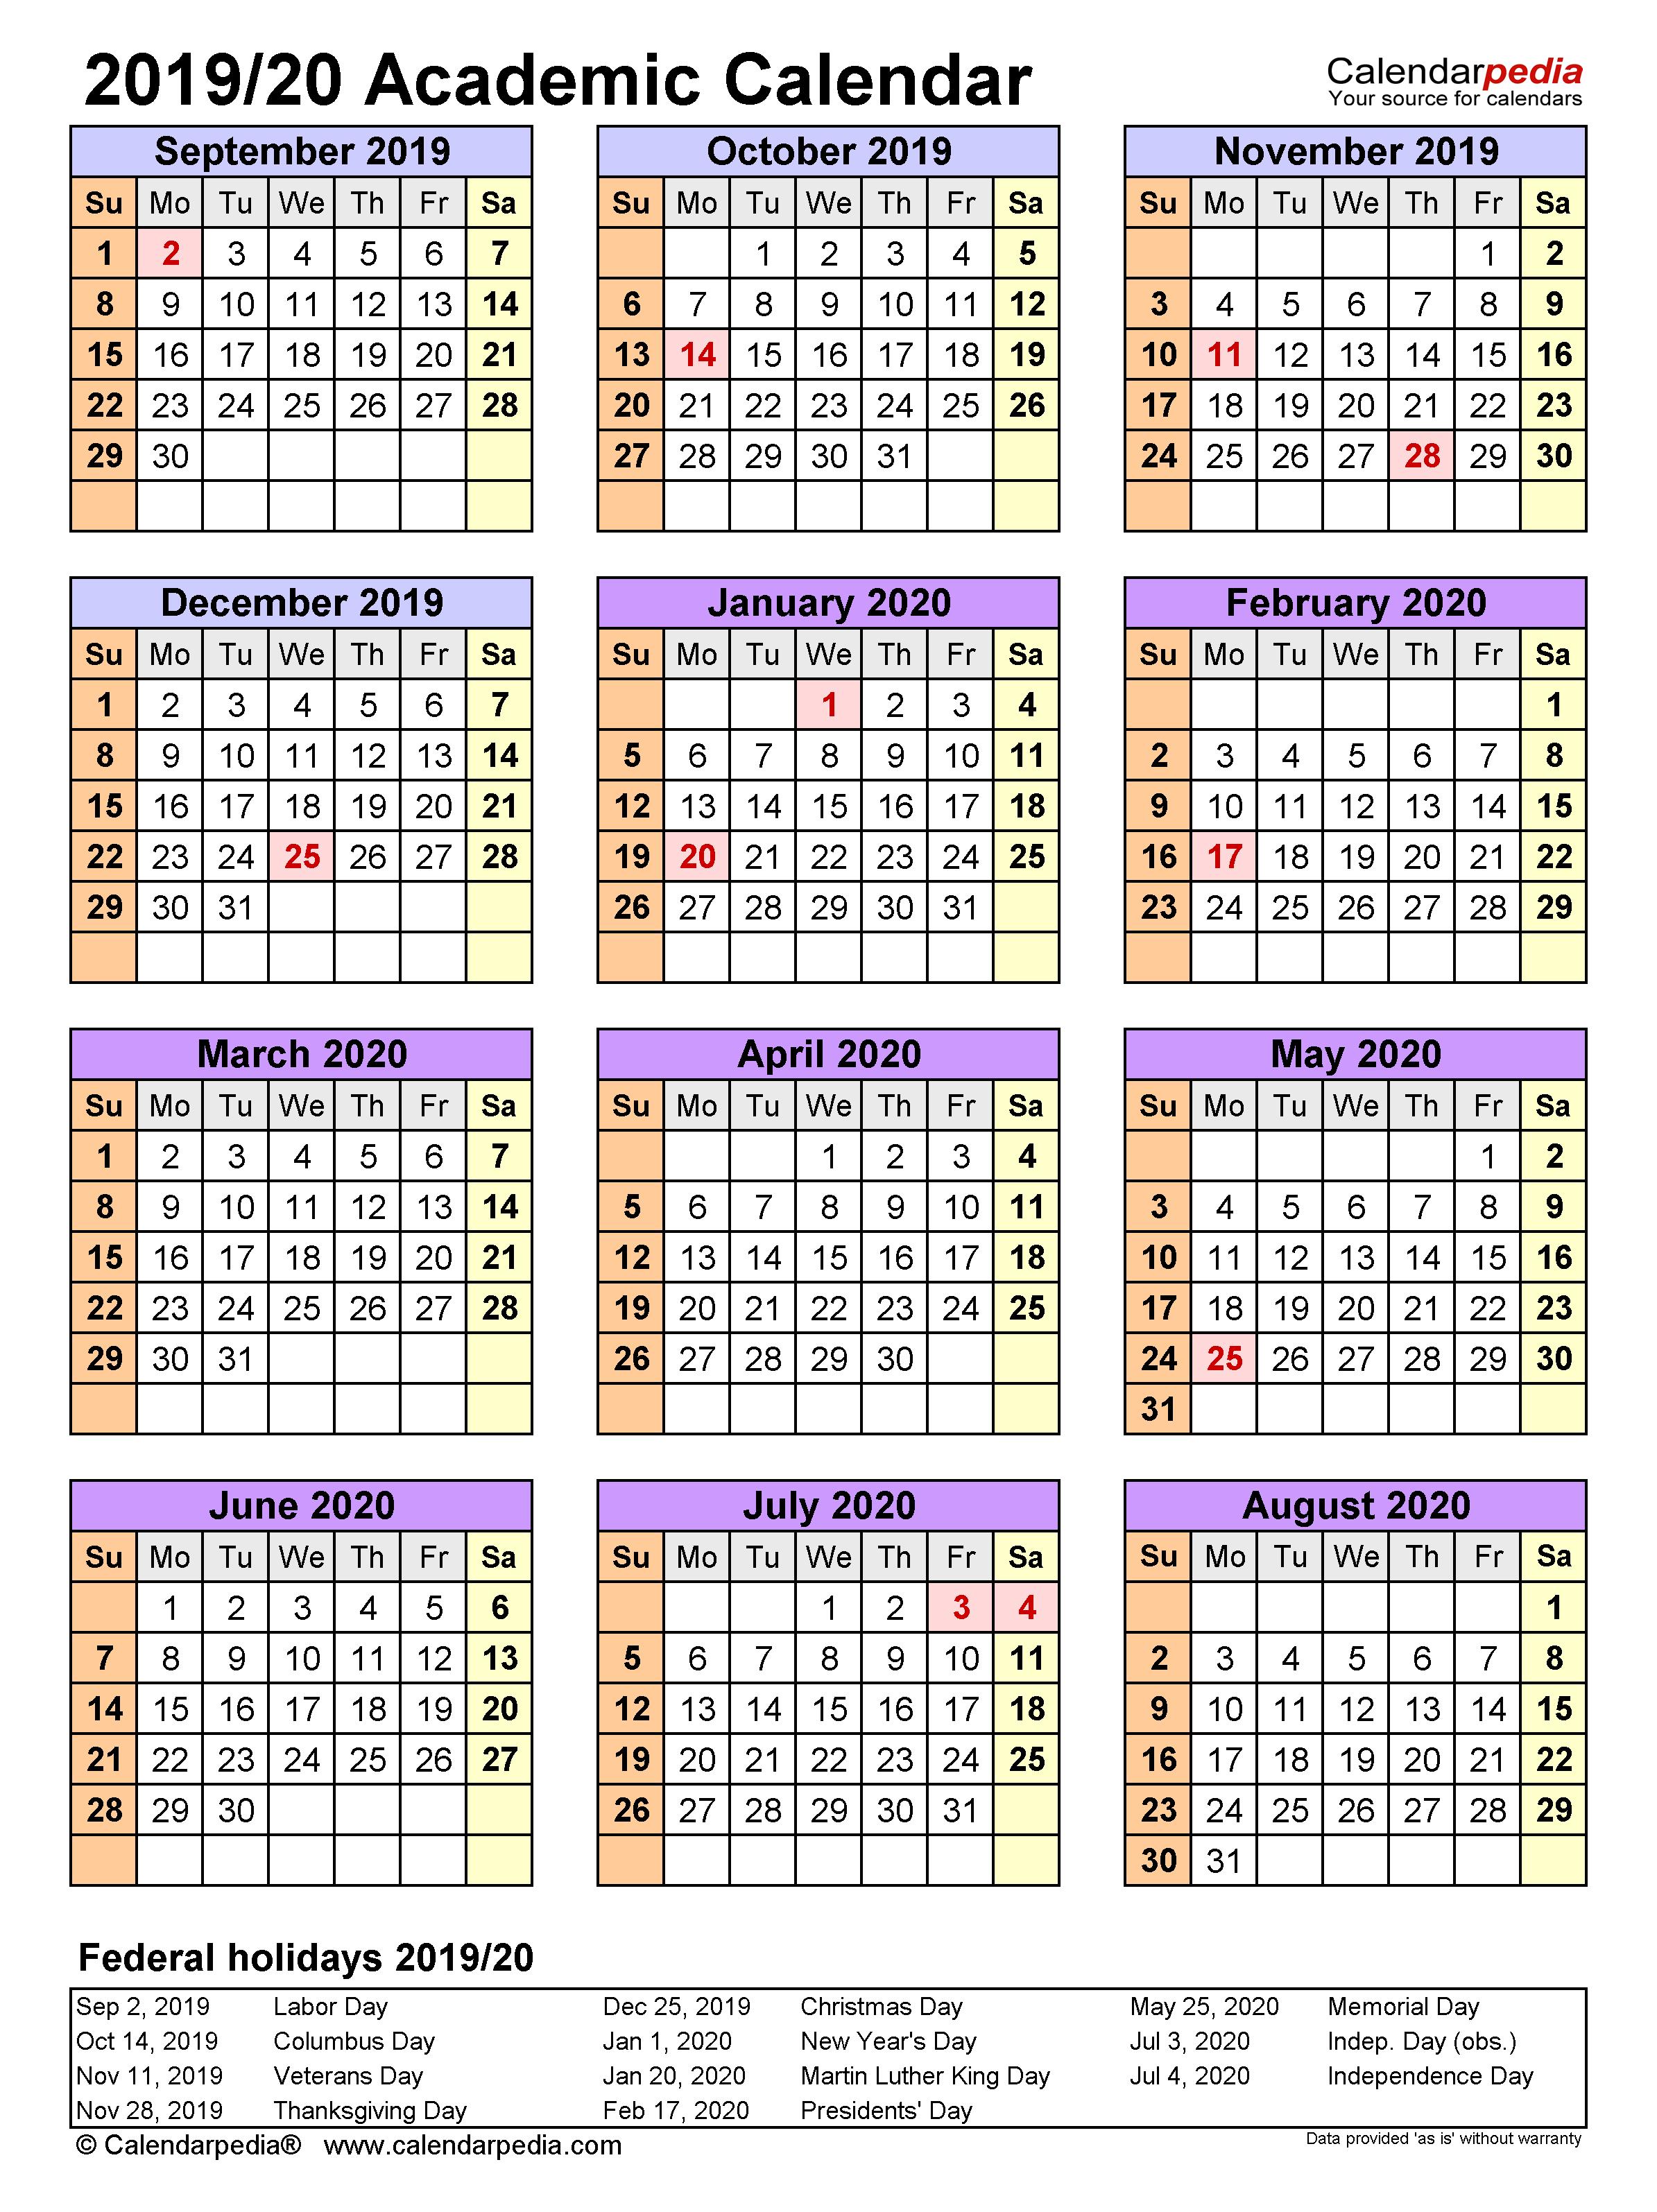 Appalachian State University Calendar 2021 22   Calendar 2021 With University Of Ri Academic Calendar 2021 2020